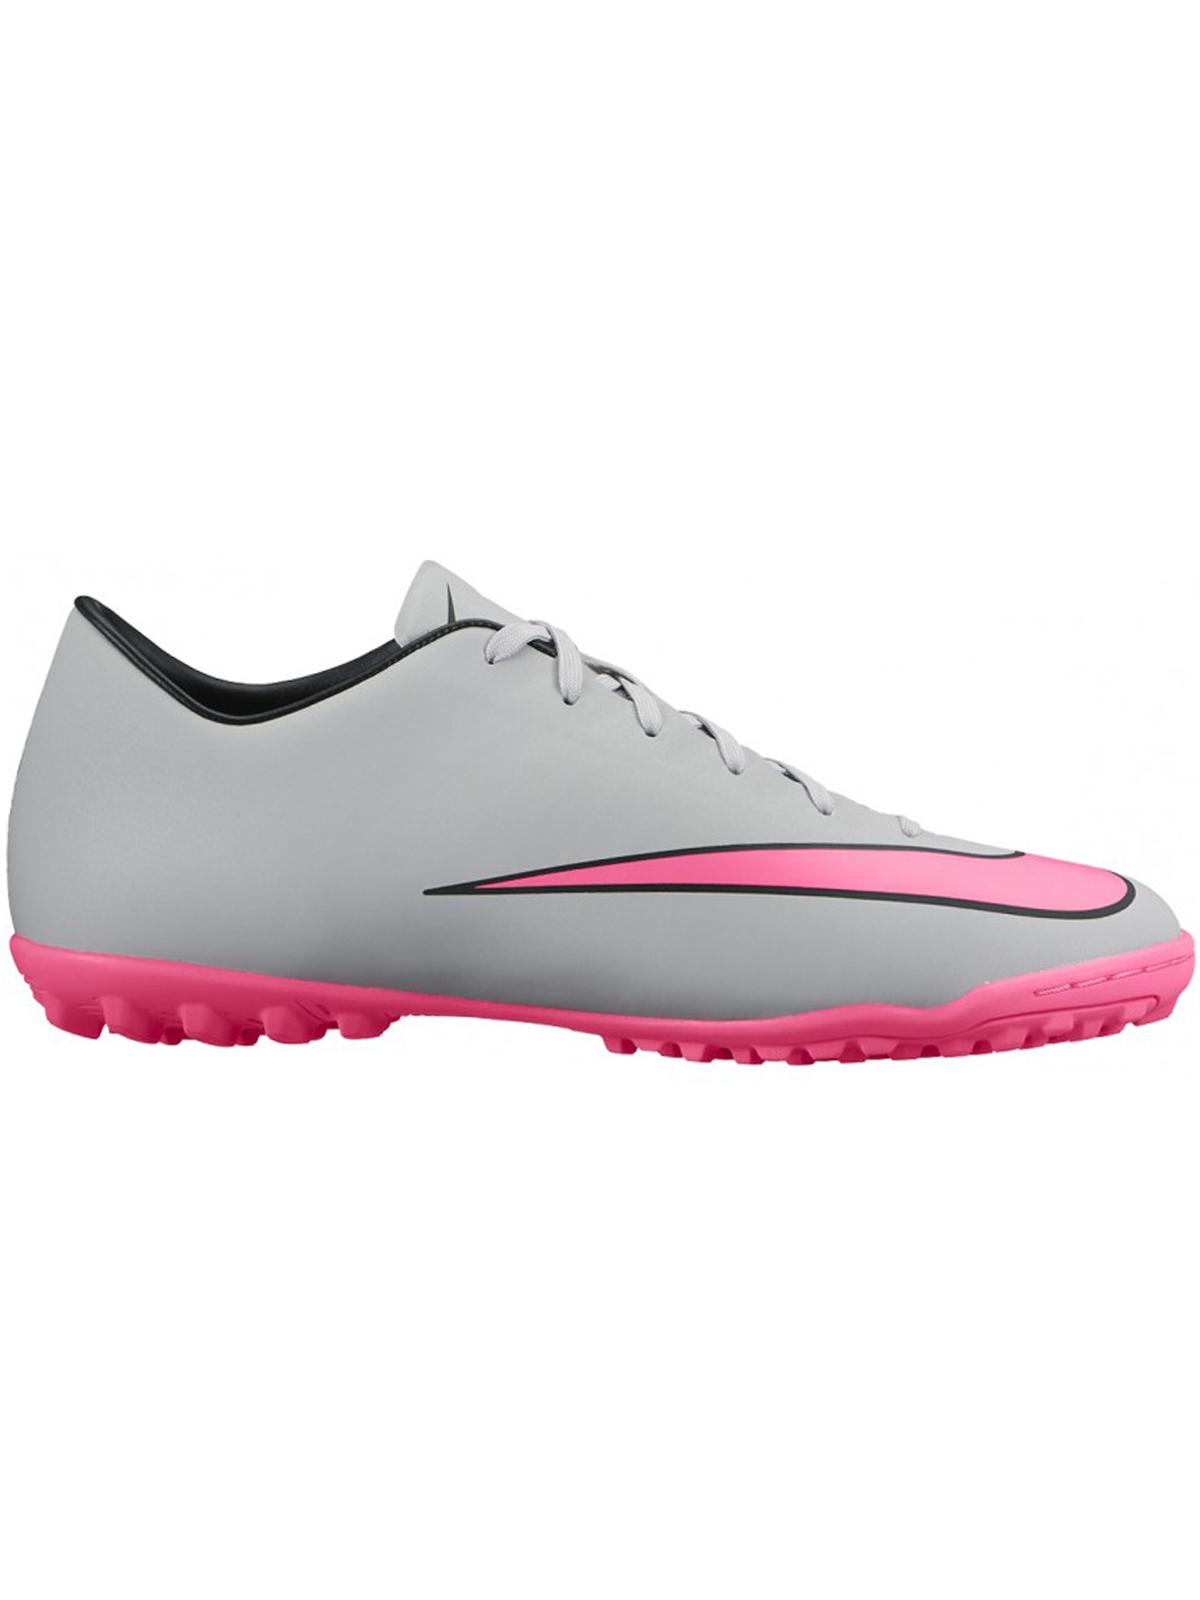 Nike Mercurial Victory V TF grigio e rosa 651646 060